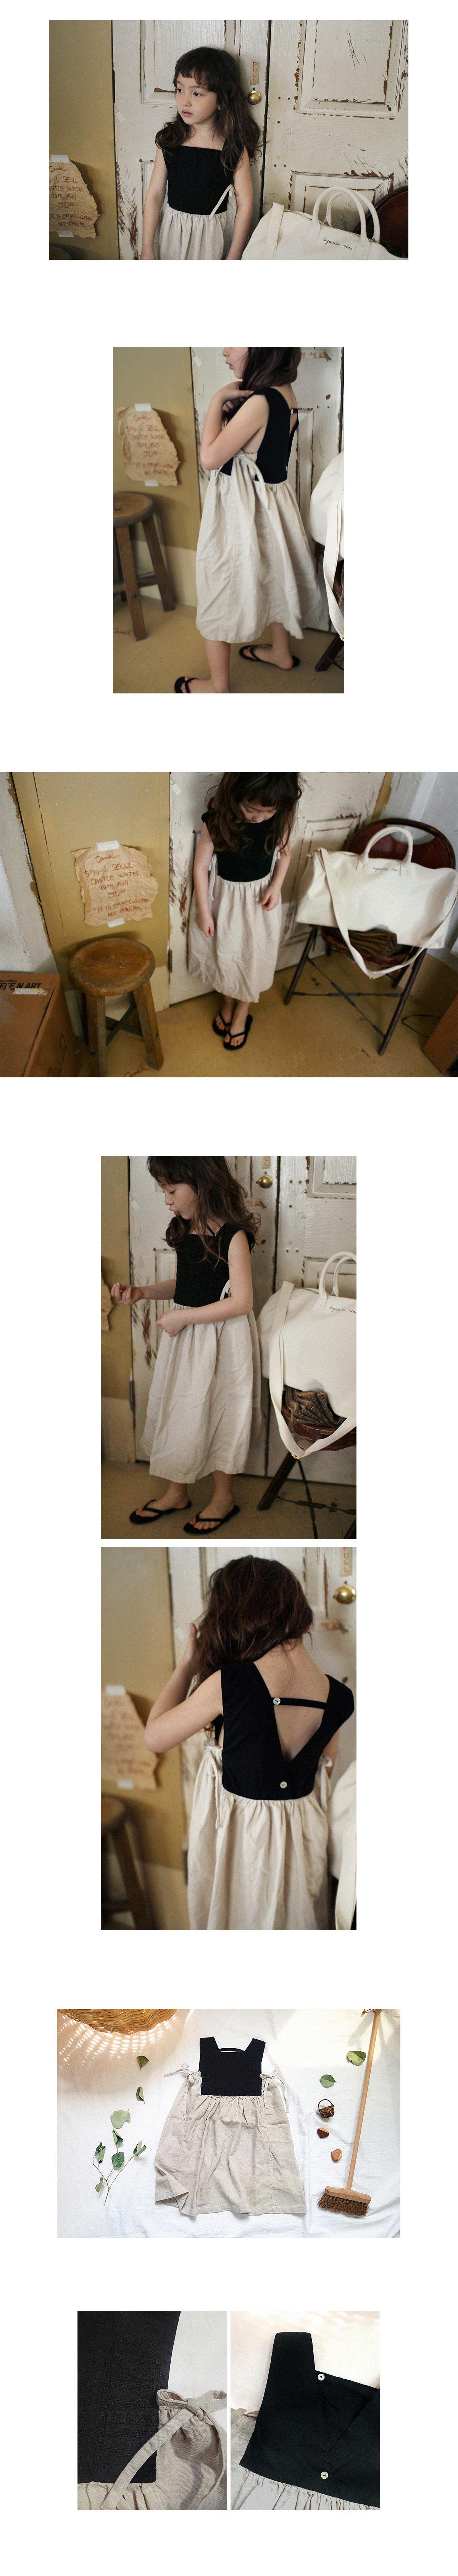 SCON - Korean Children Fashion - #Kfashion4kids - Giselle One-piece - 2